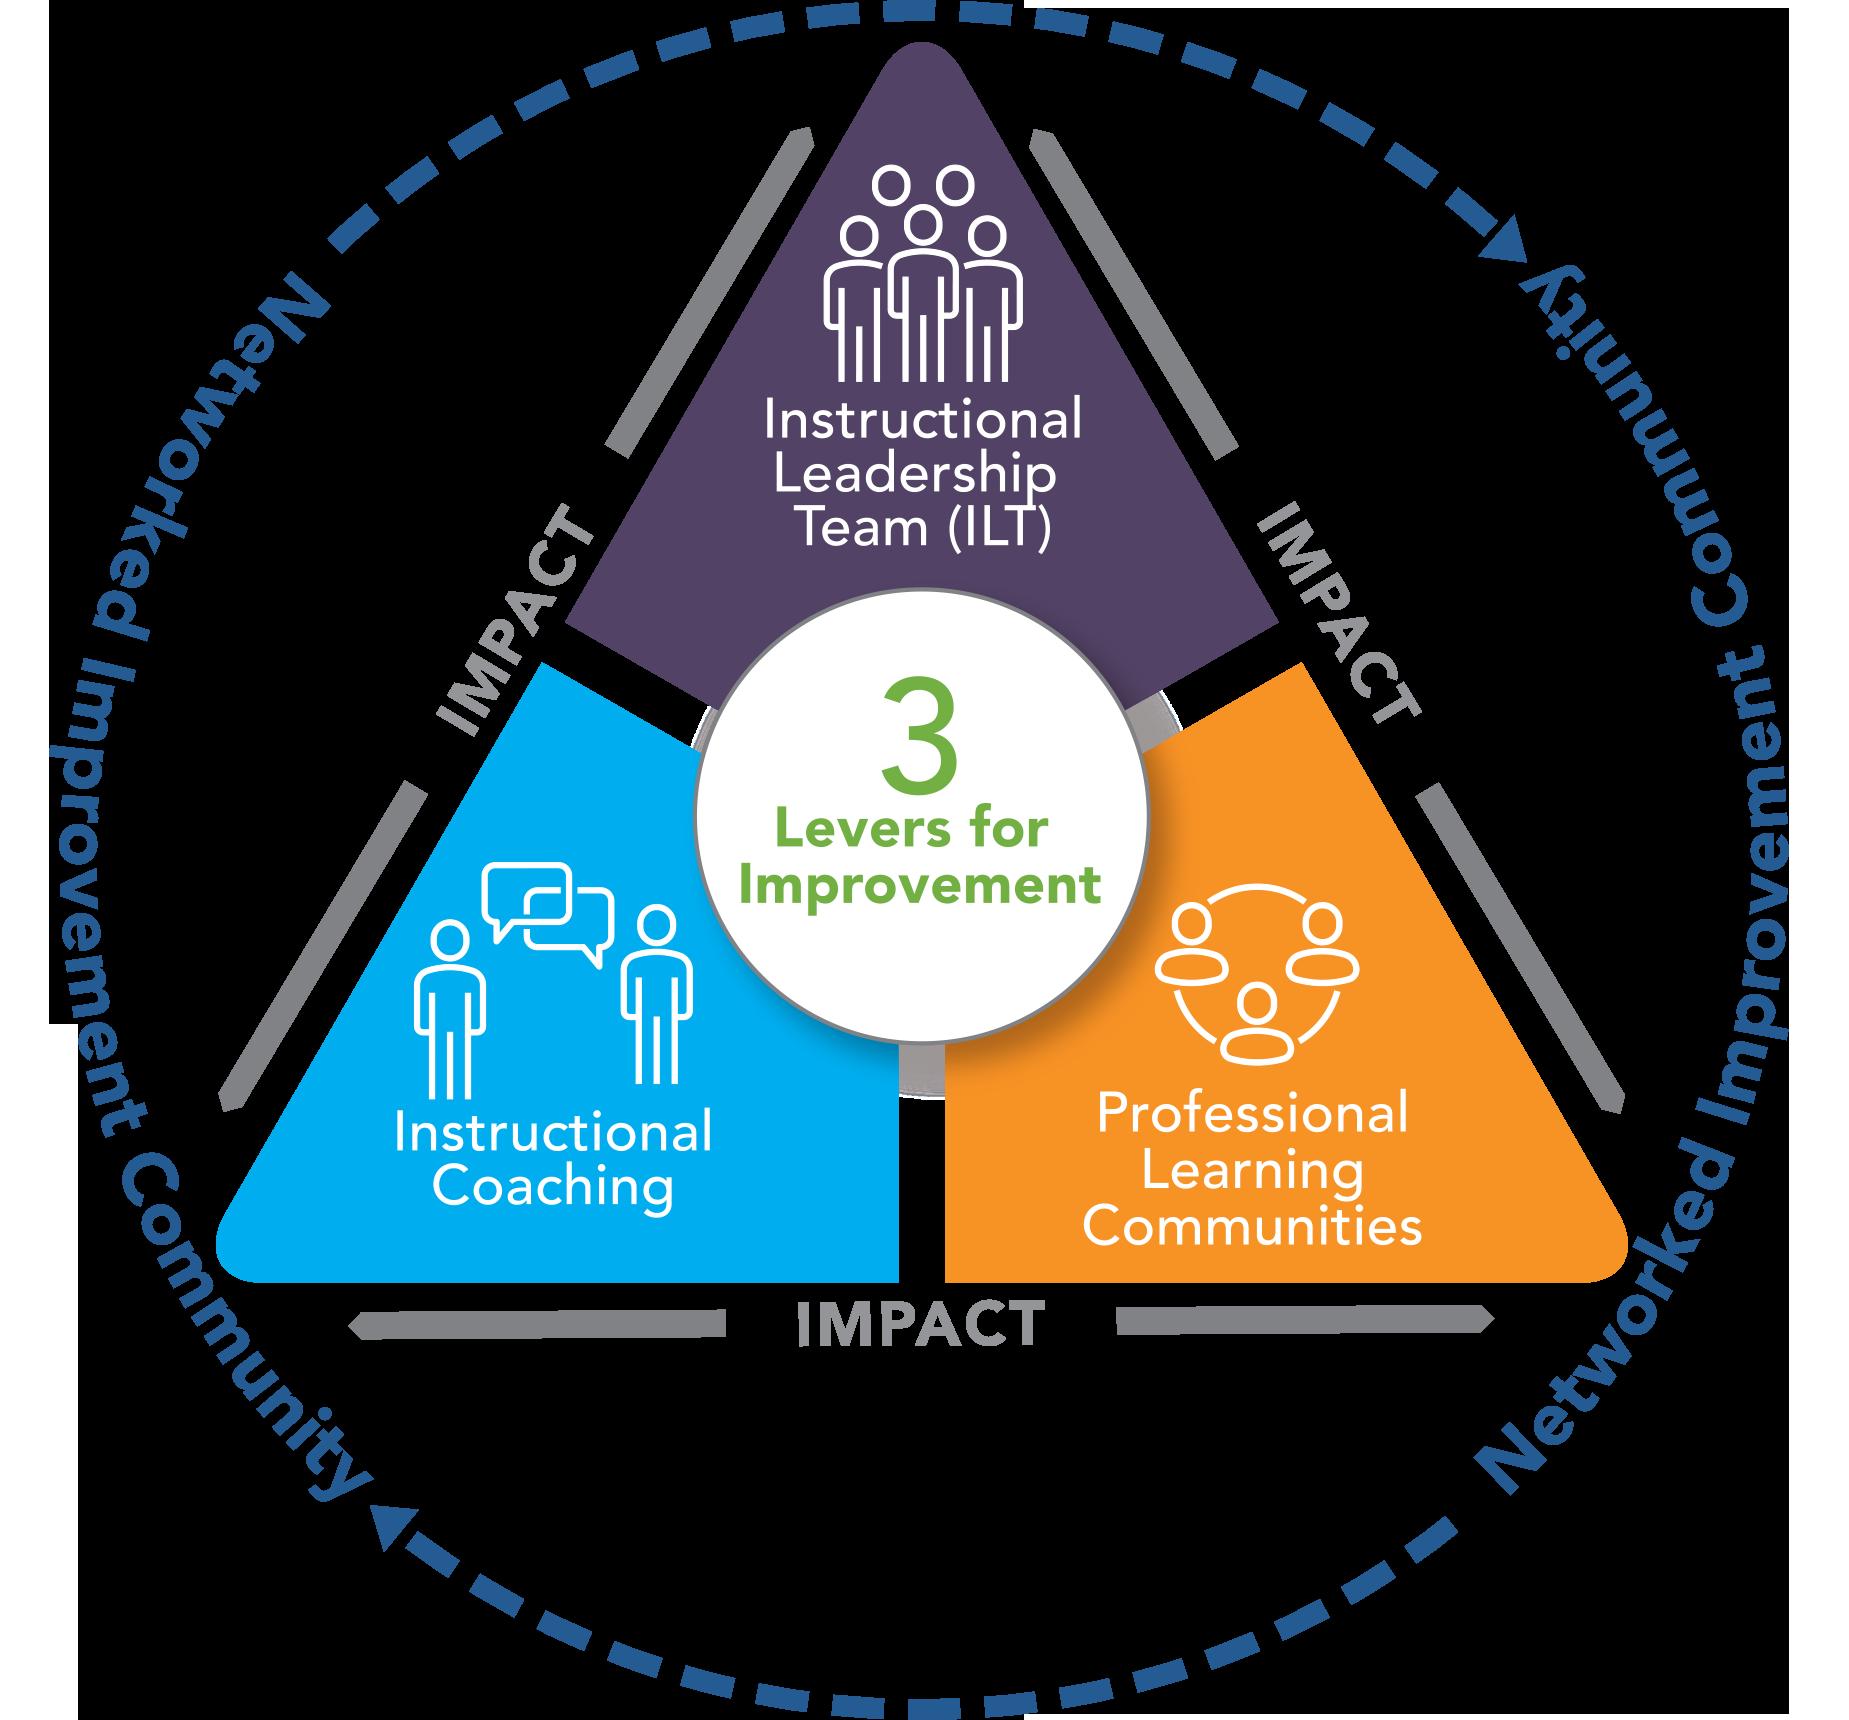 Three Key Levers for School Improvement - ILTs, coaching, & PLCs